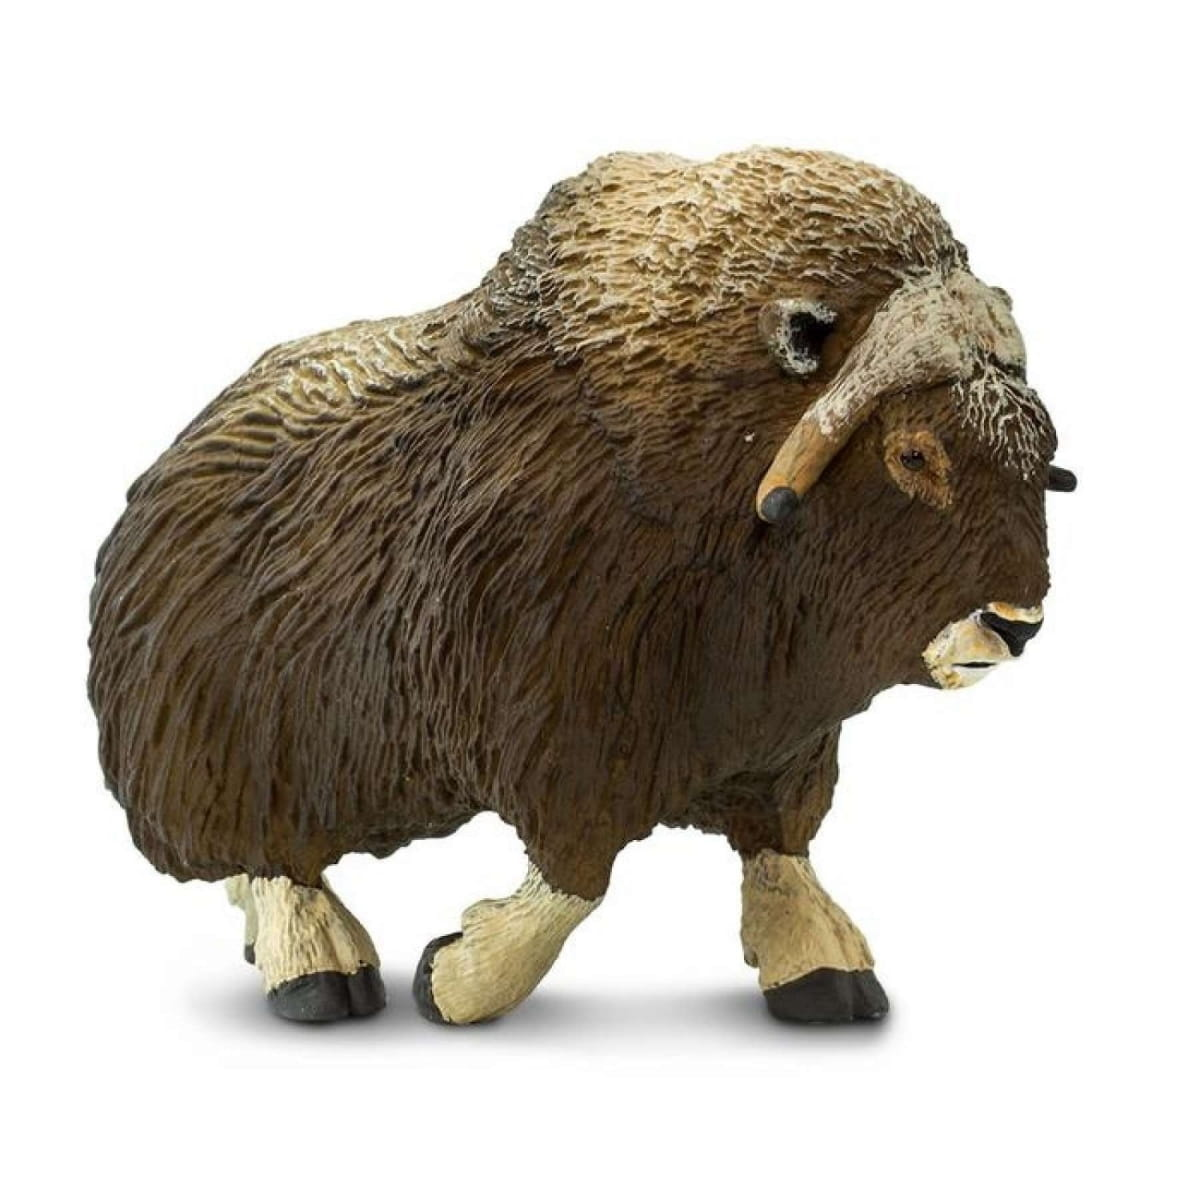 Фигурка SAFARI Овцебык - Фигурки животных